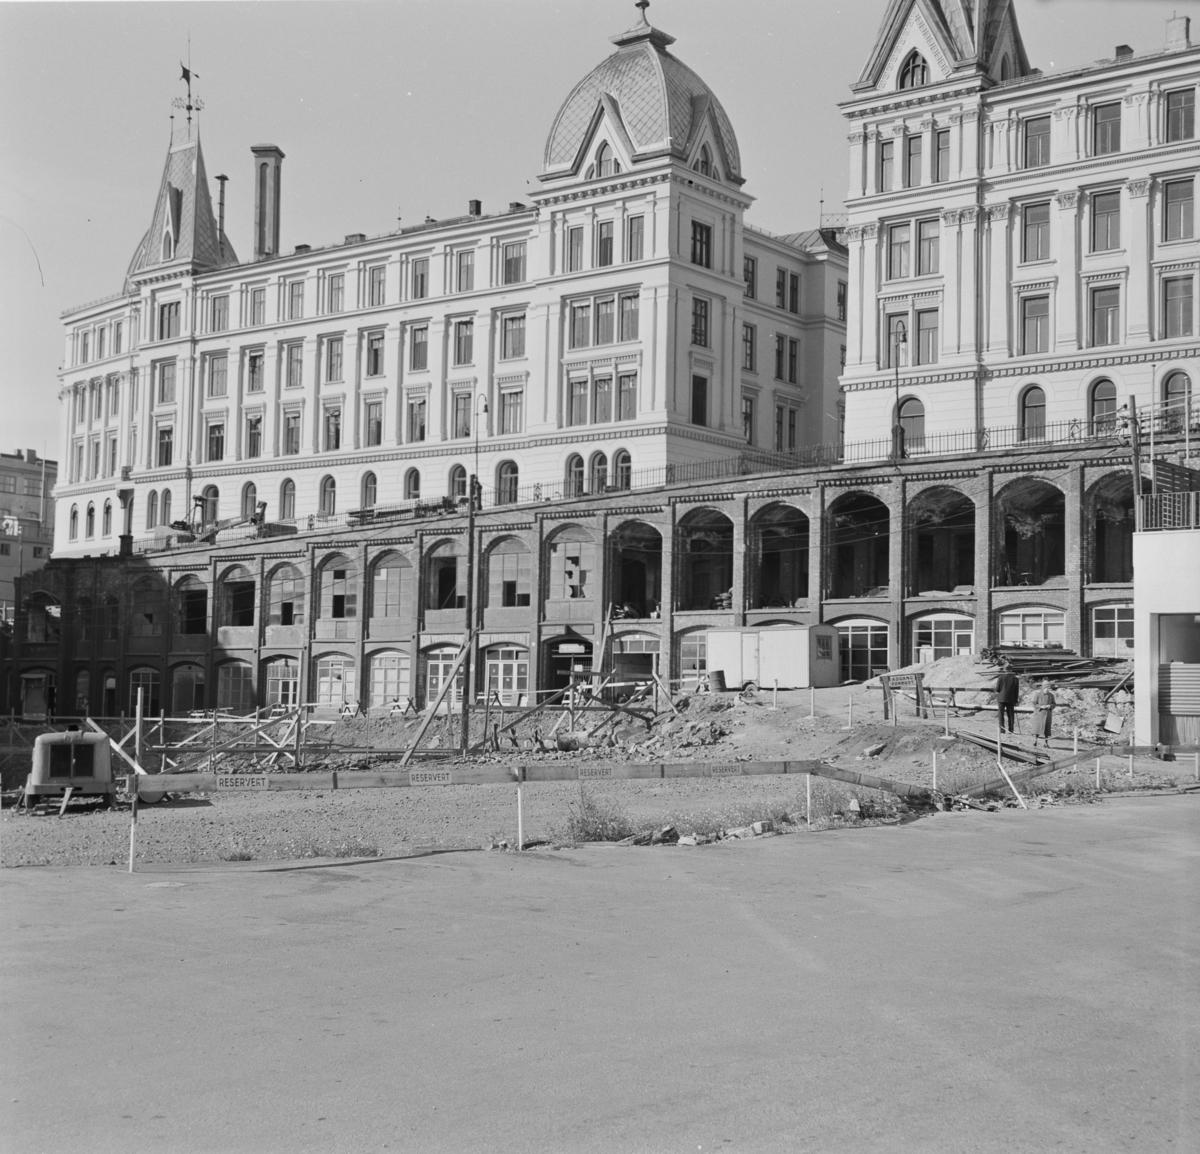 De gamle Vika-terrassene i Oslo under riving.